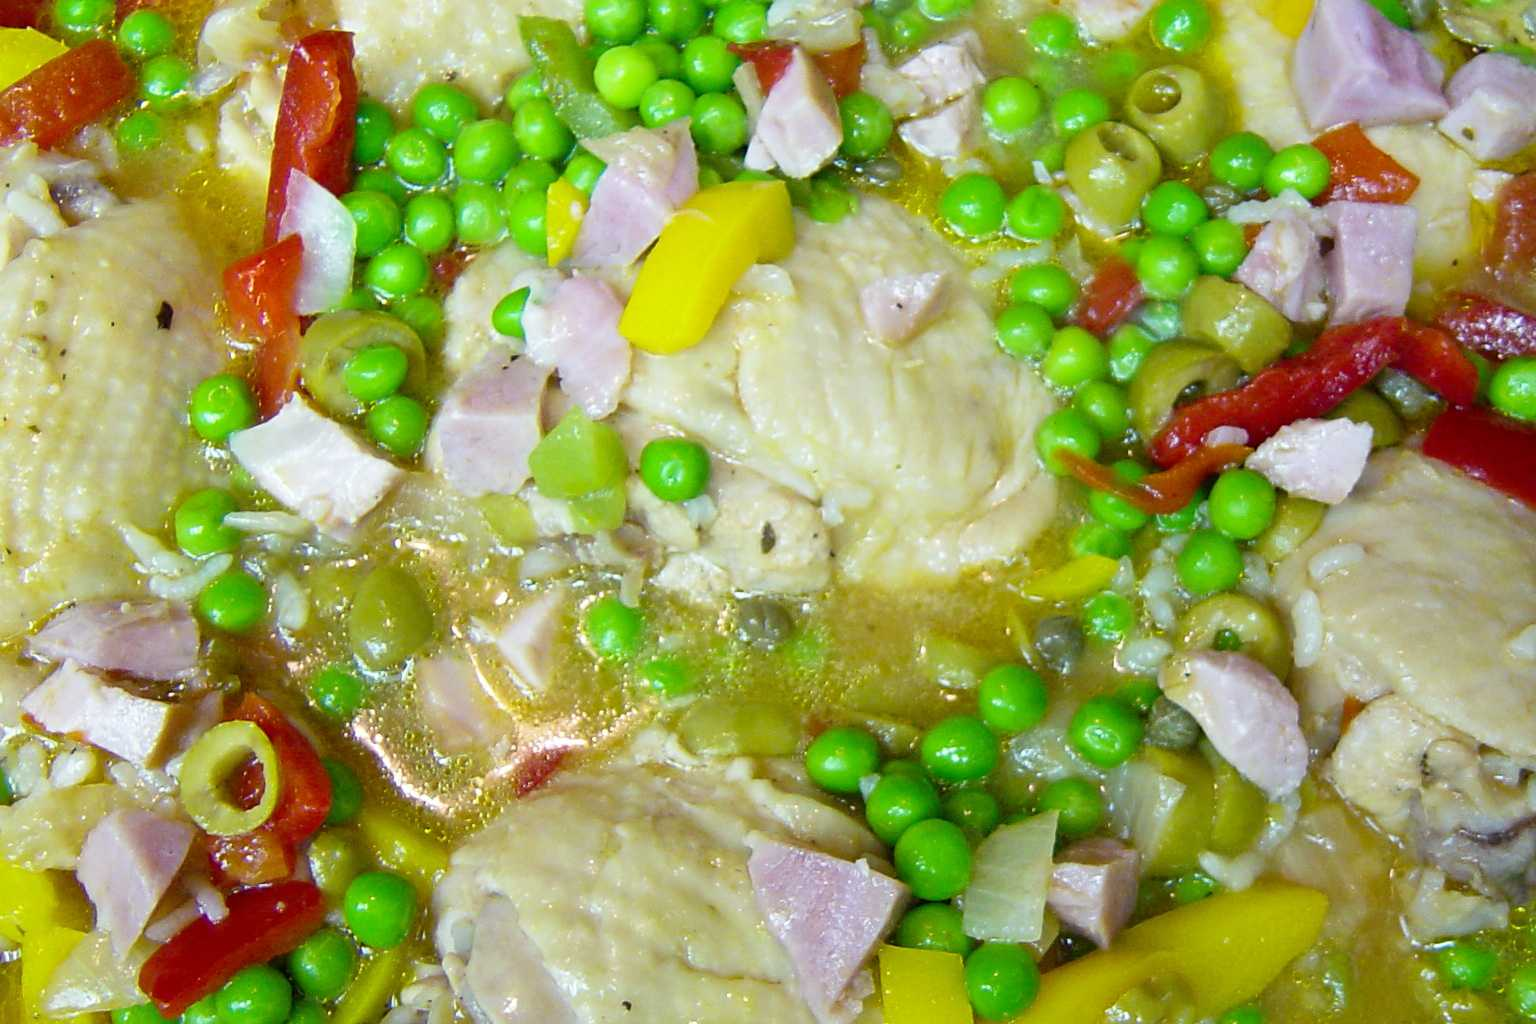 Asopao chicken noodle soup